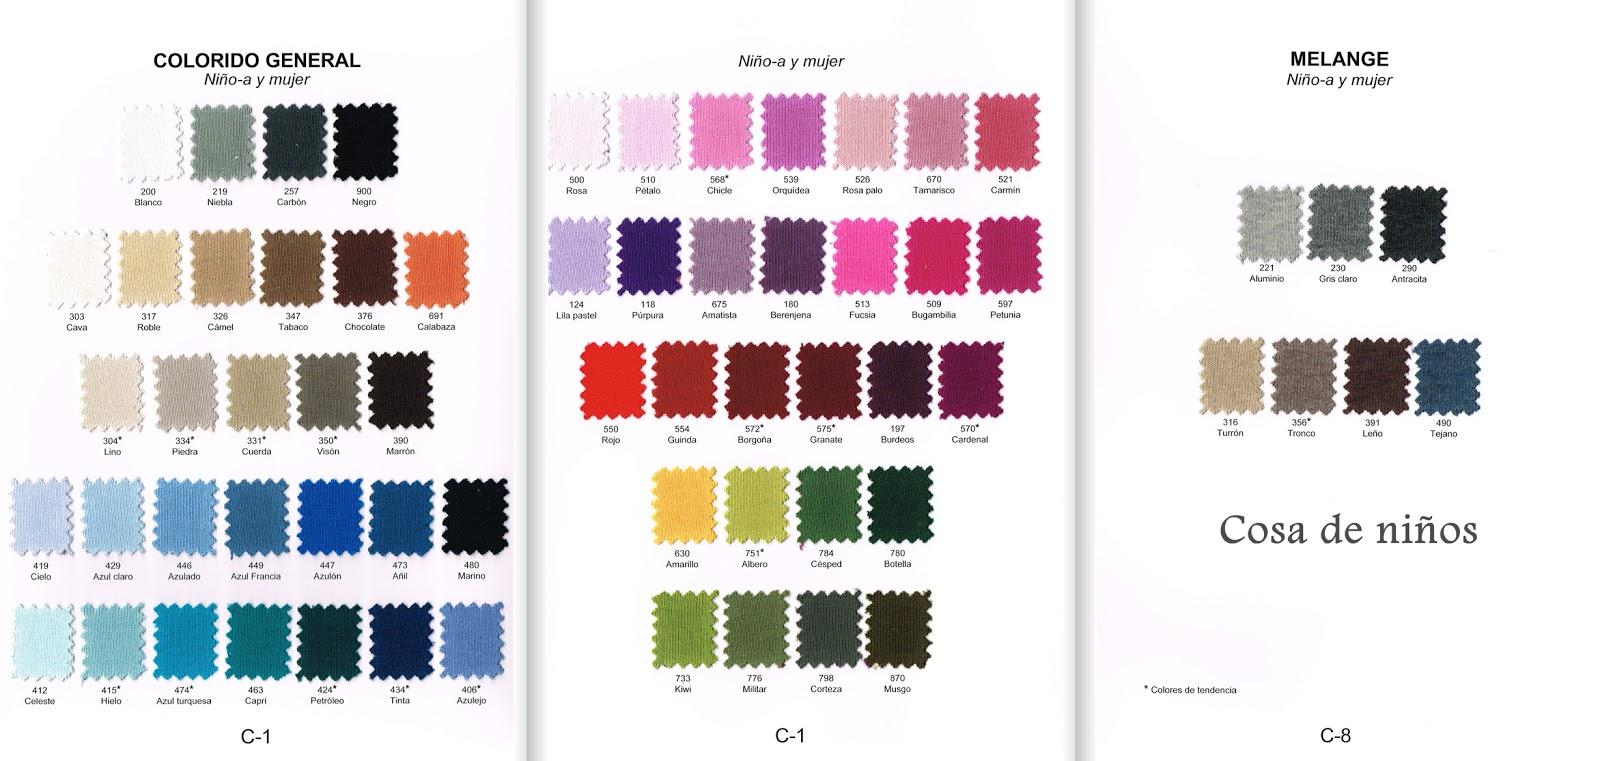 Cosa de ni os promoci n c ndor 3x2 for Colores condor